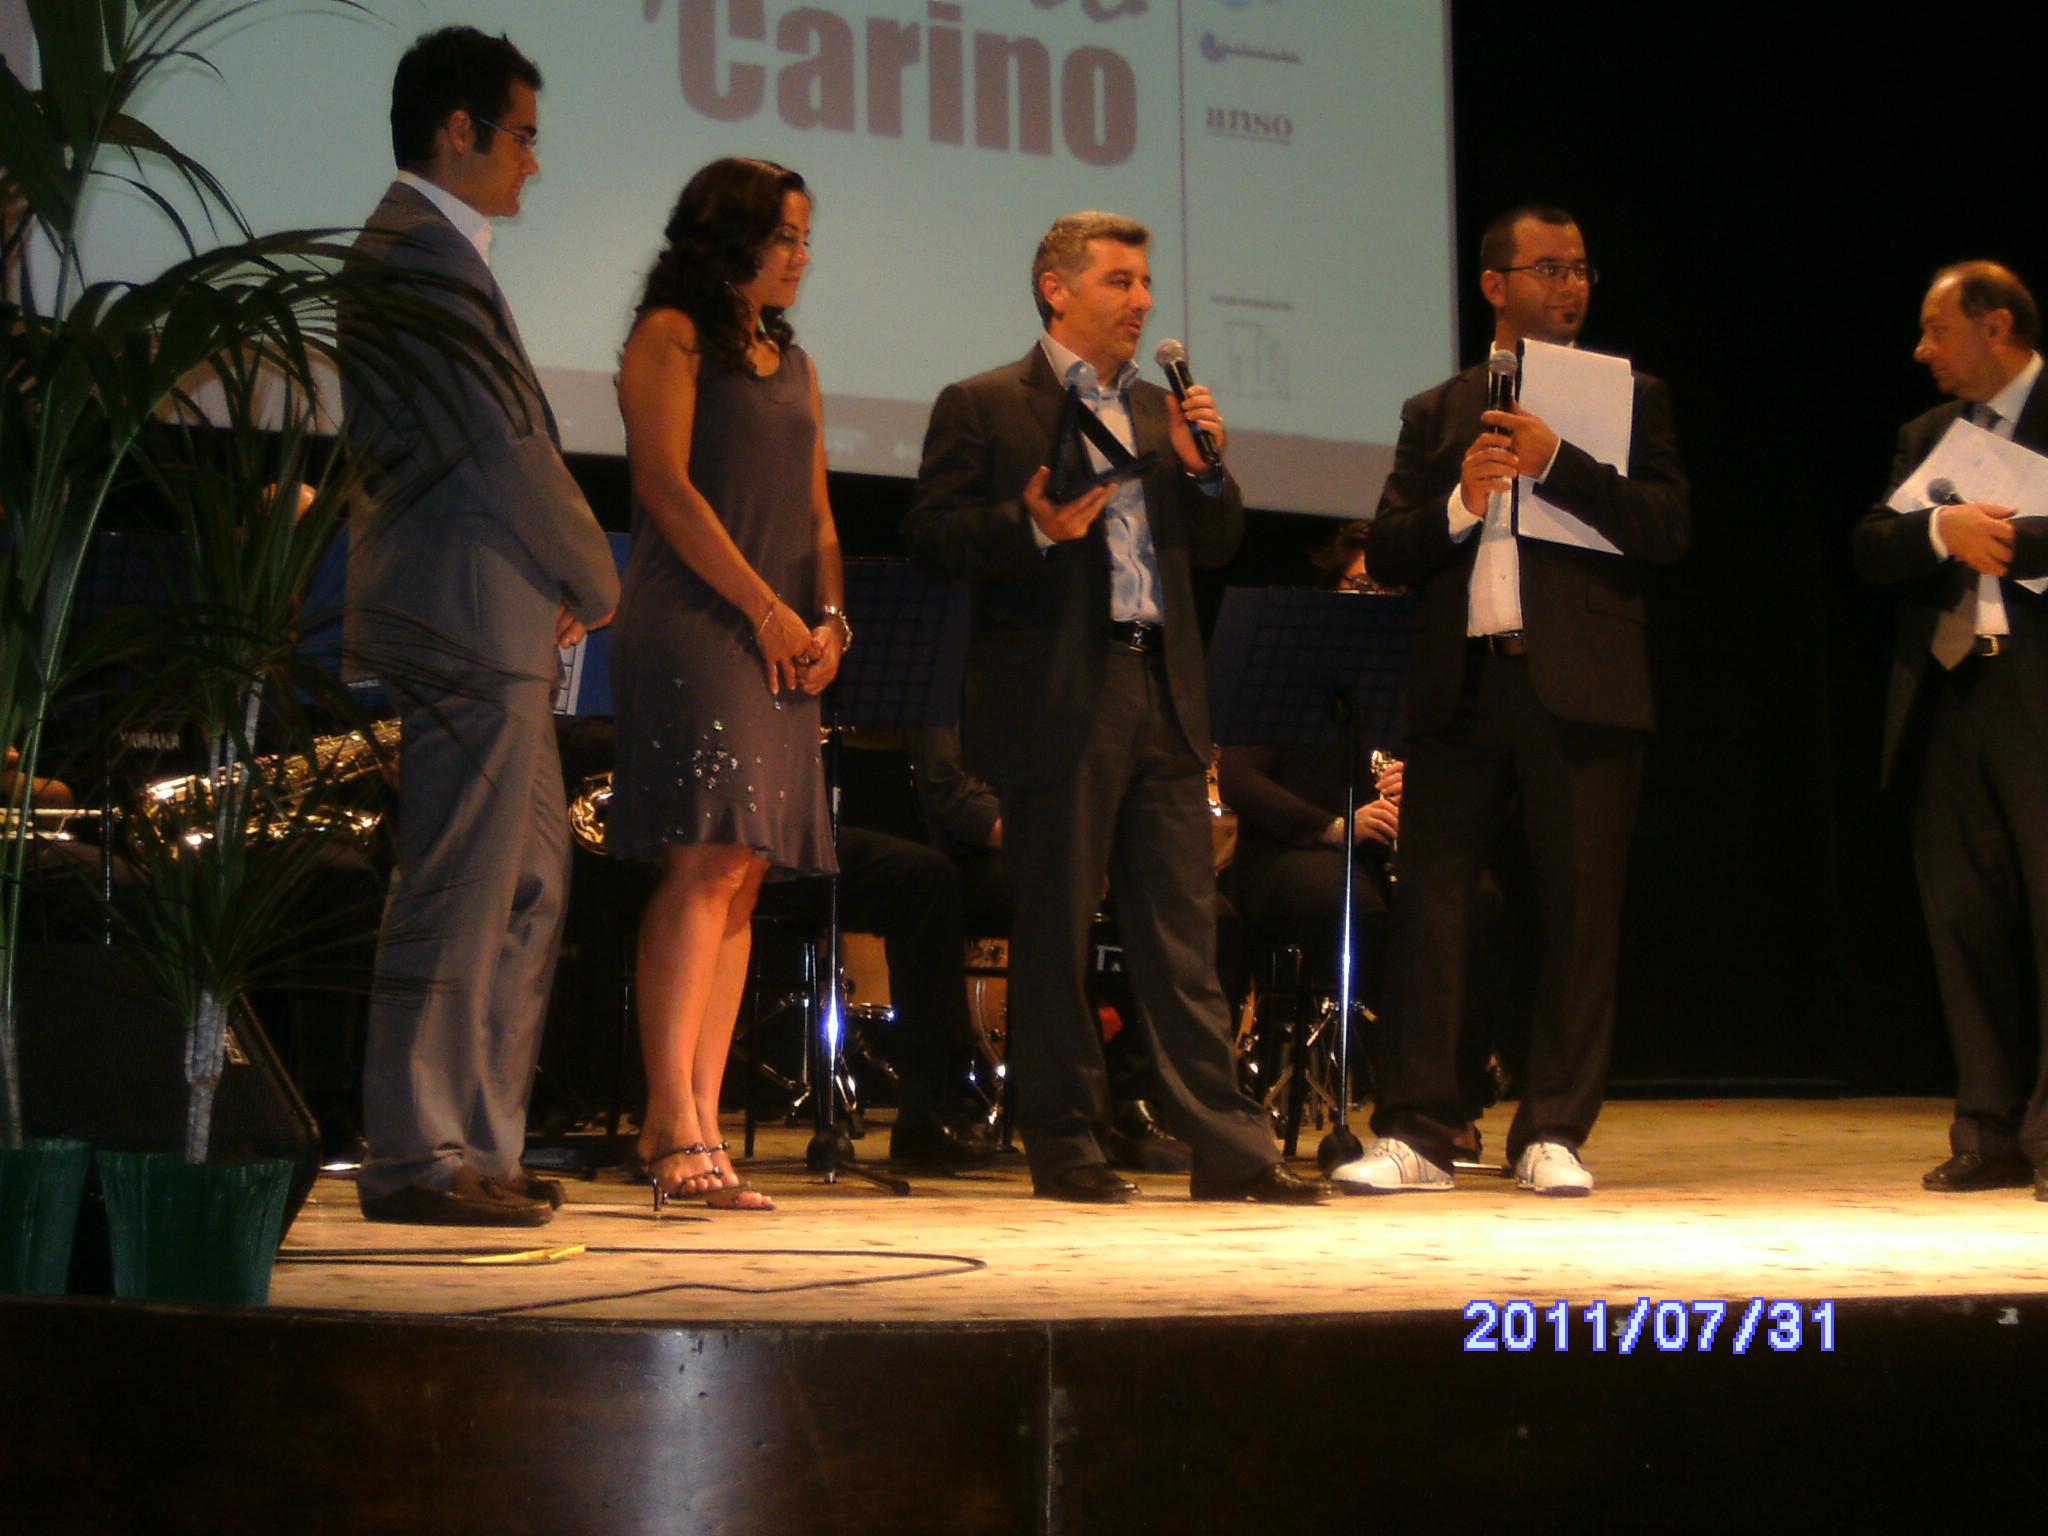 Riccardo e Daria Carino, Pierfrancesco Simoni, Luca Sestili